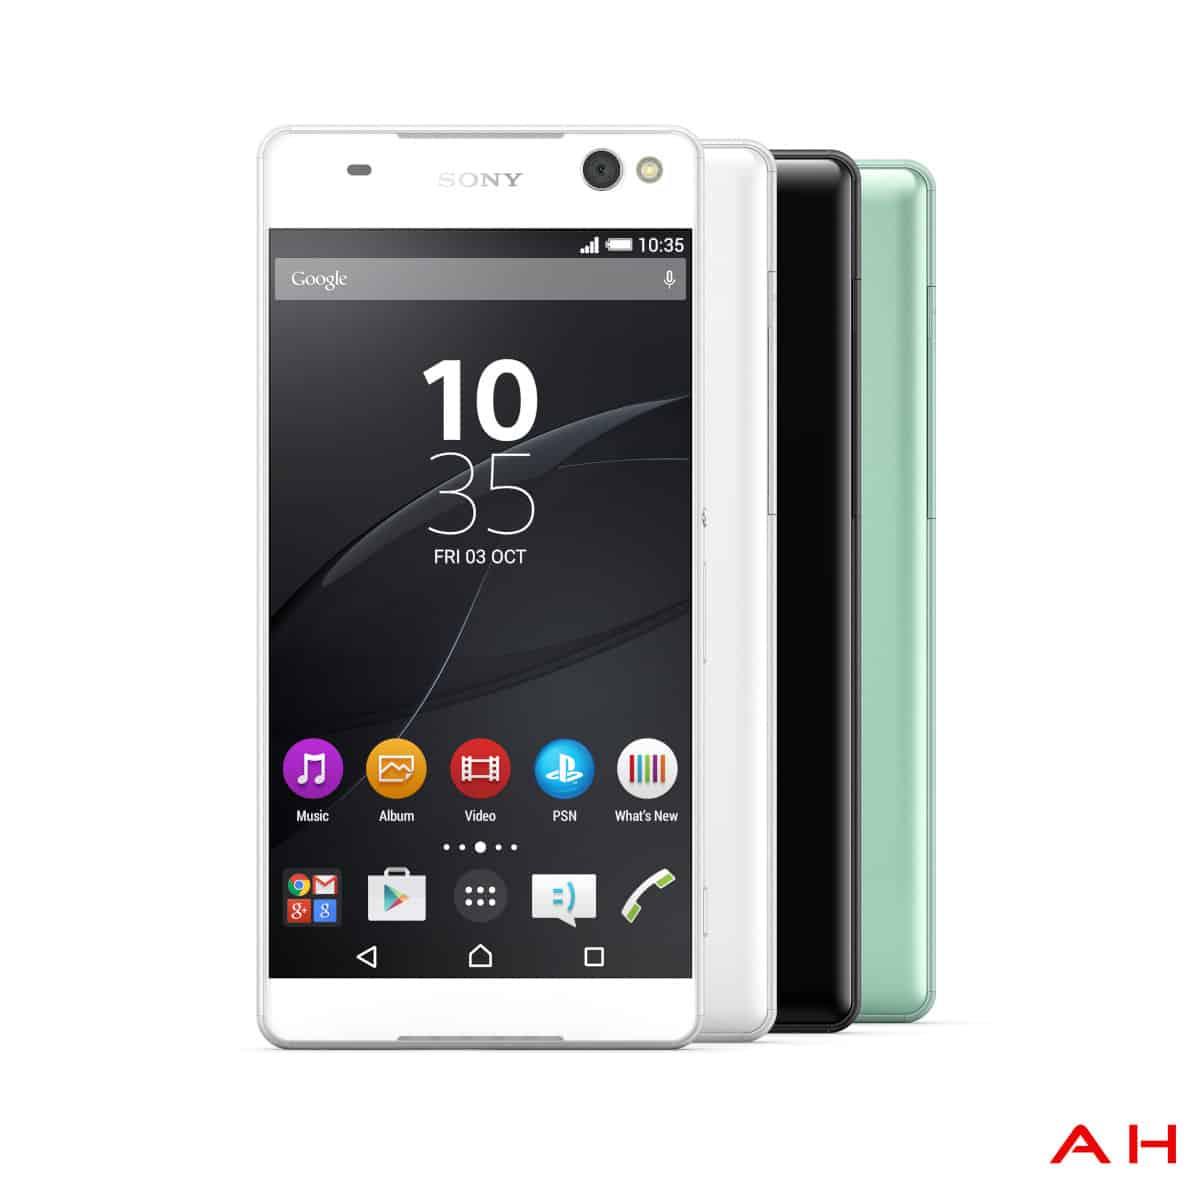 AH Sony Xperia C5 Ultra Press Images 4